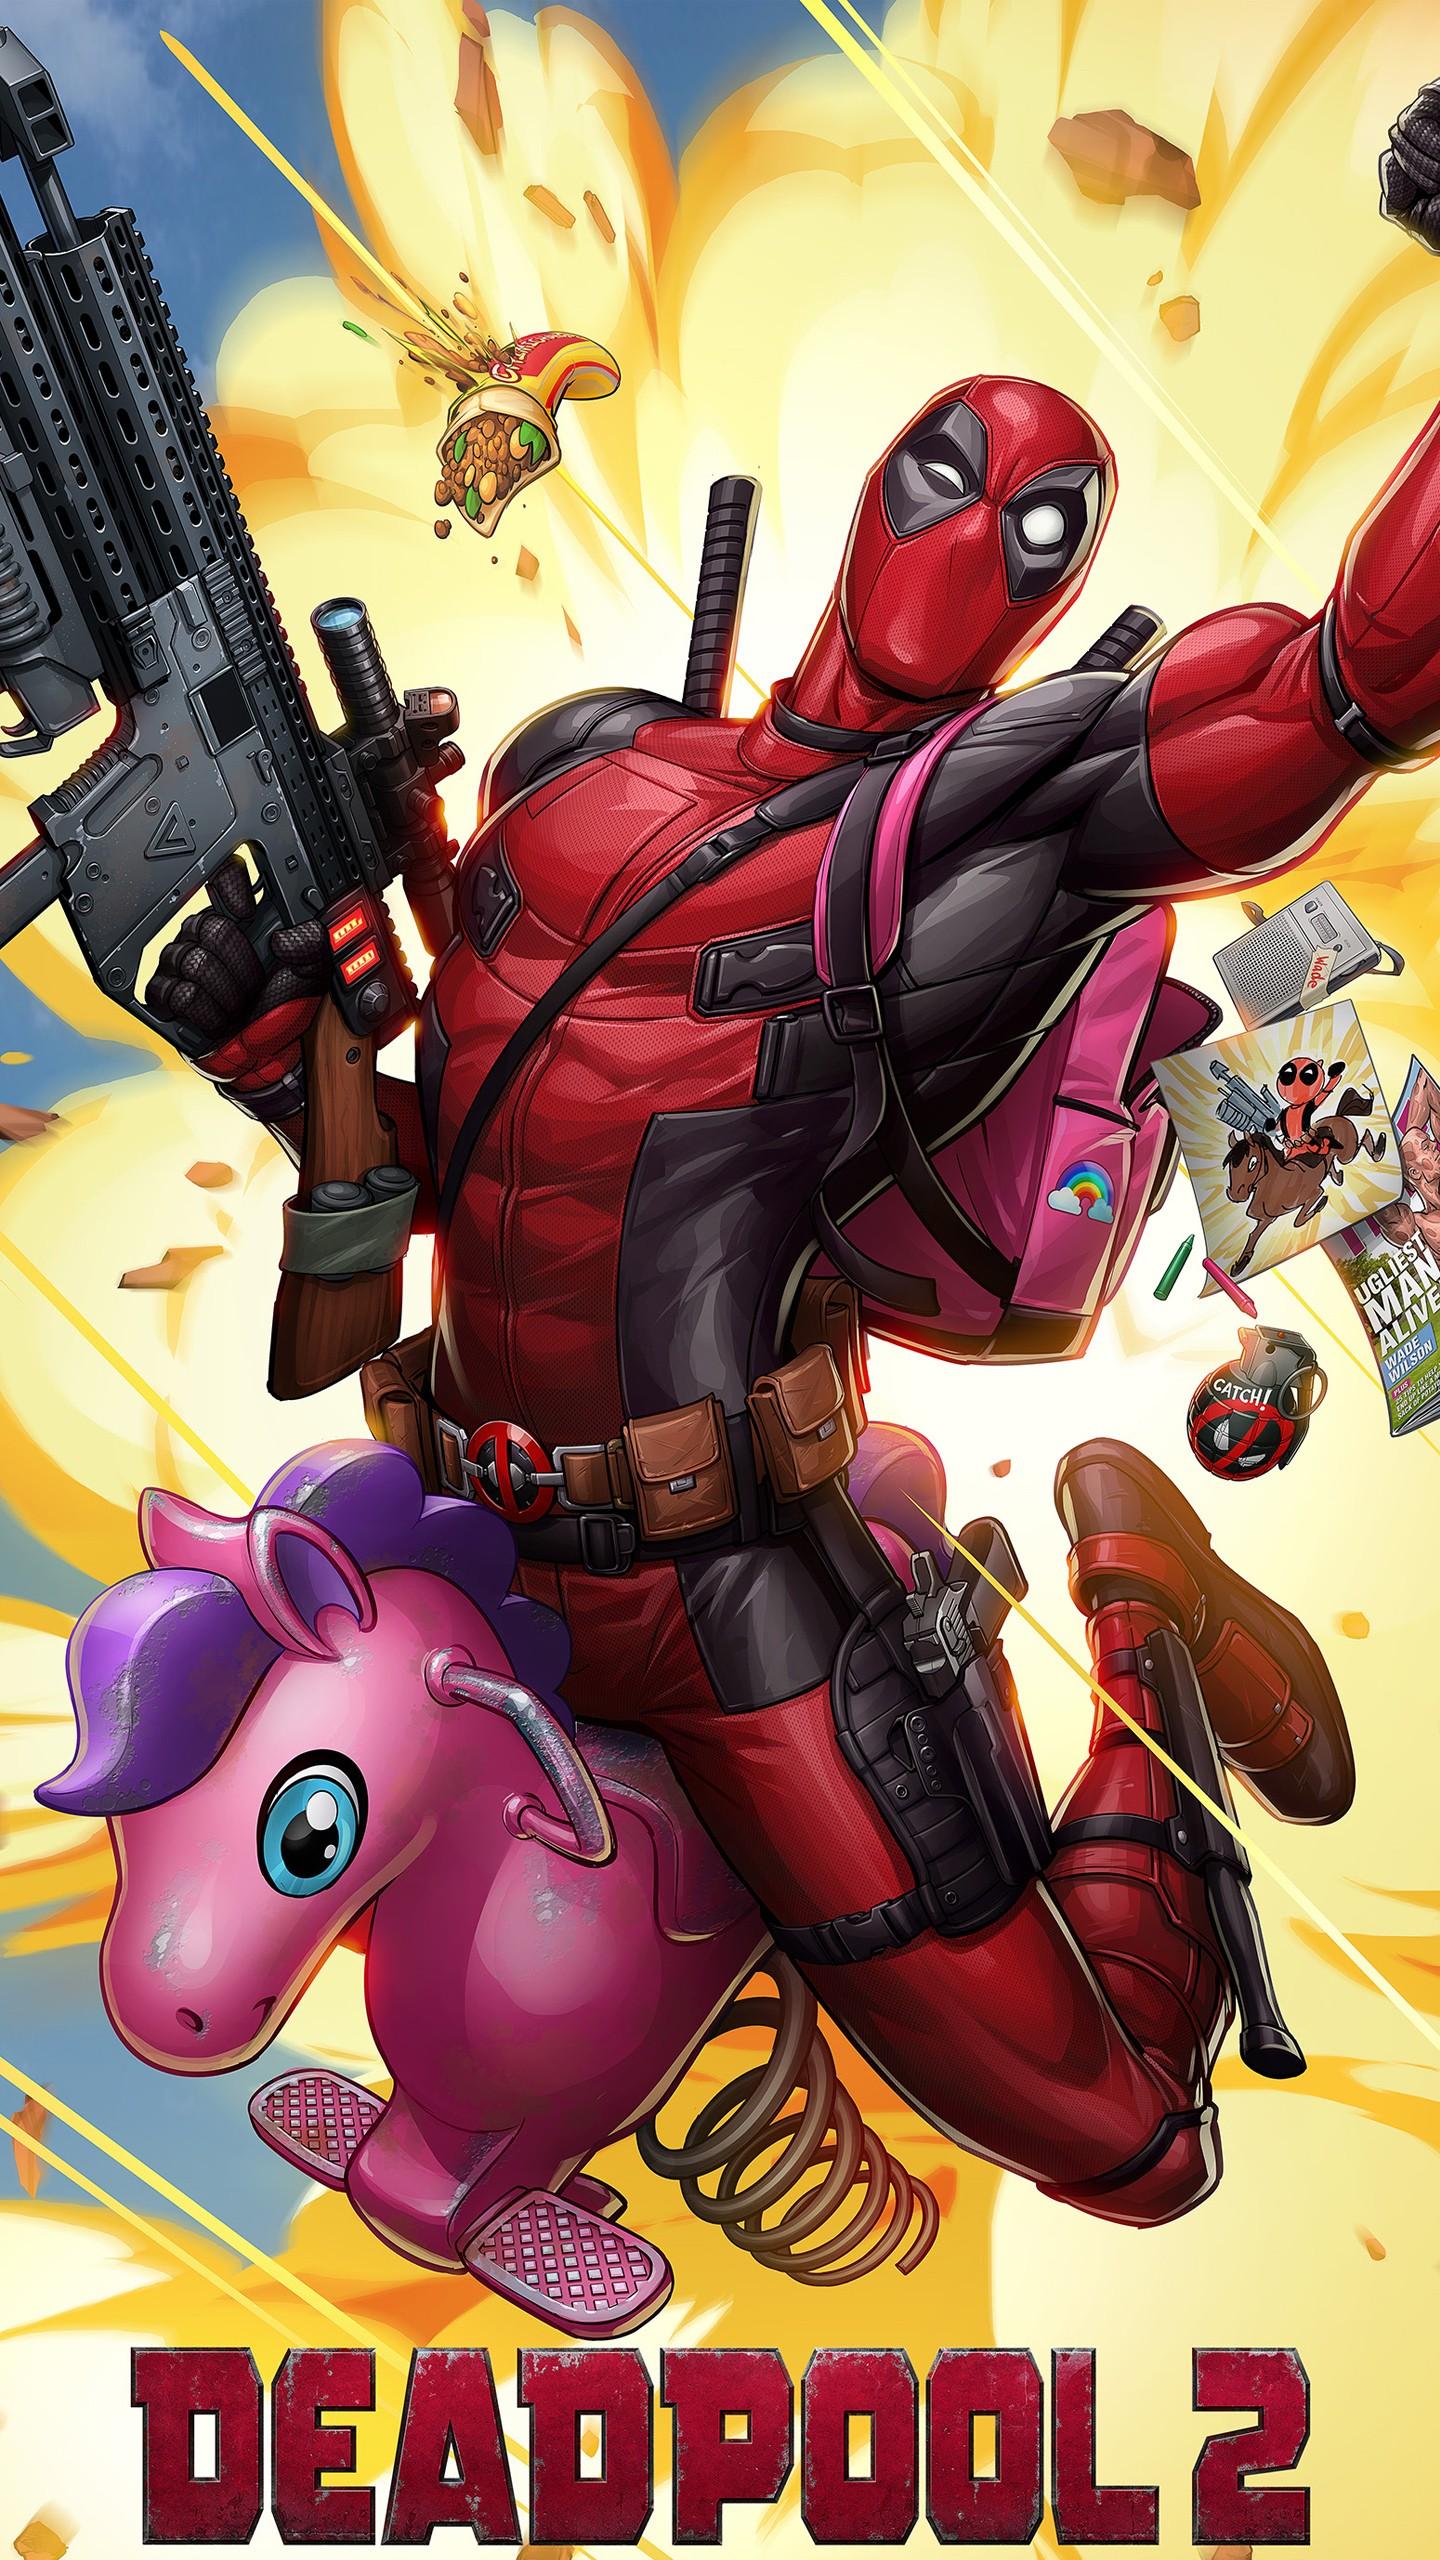 Deadpool Wallpaper For Iphone X Deadpool 2 Wallpapers Hd Wallpapers Id 23935